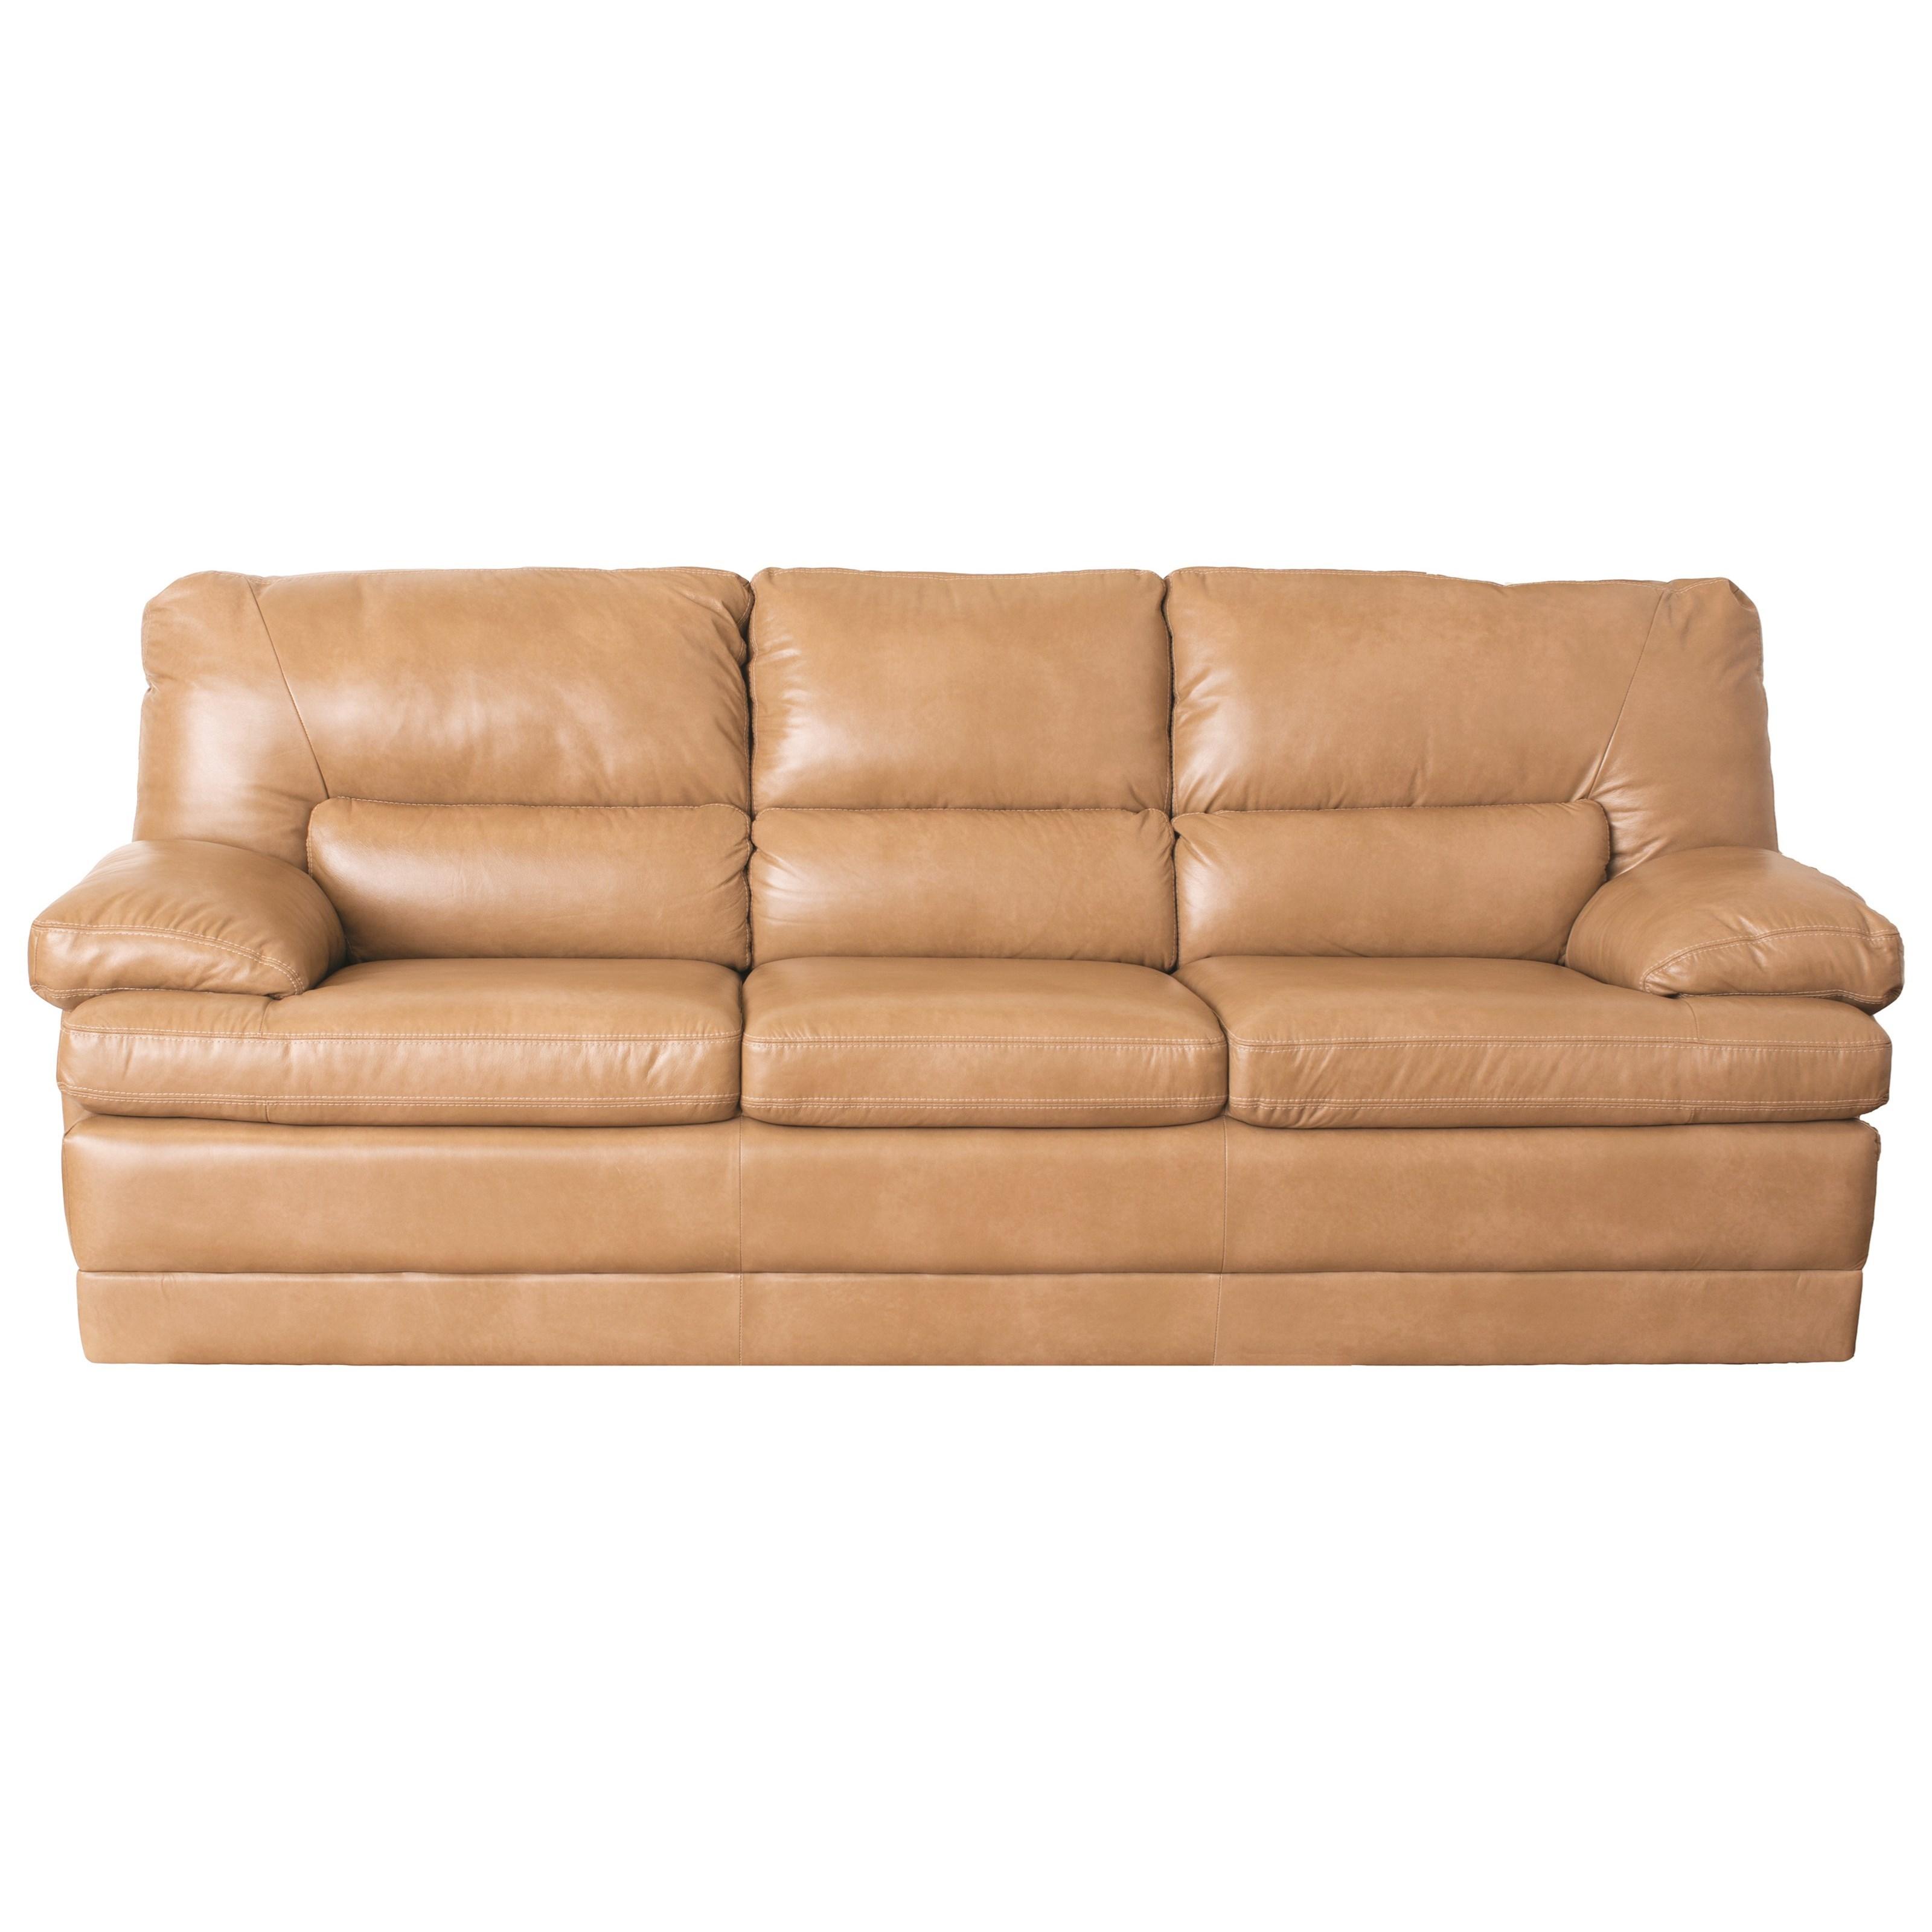 Palliser Northbrook Contemporary Sofa W/ Pillow Arms